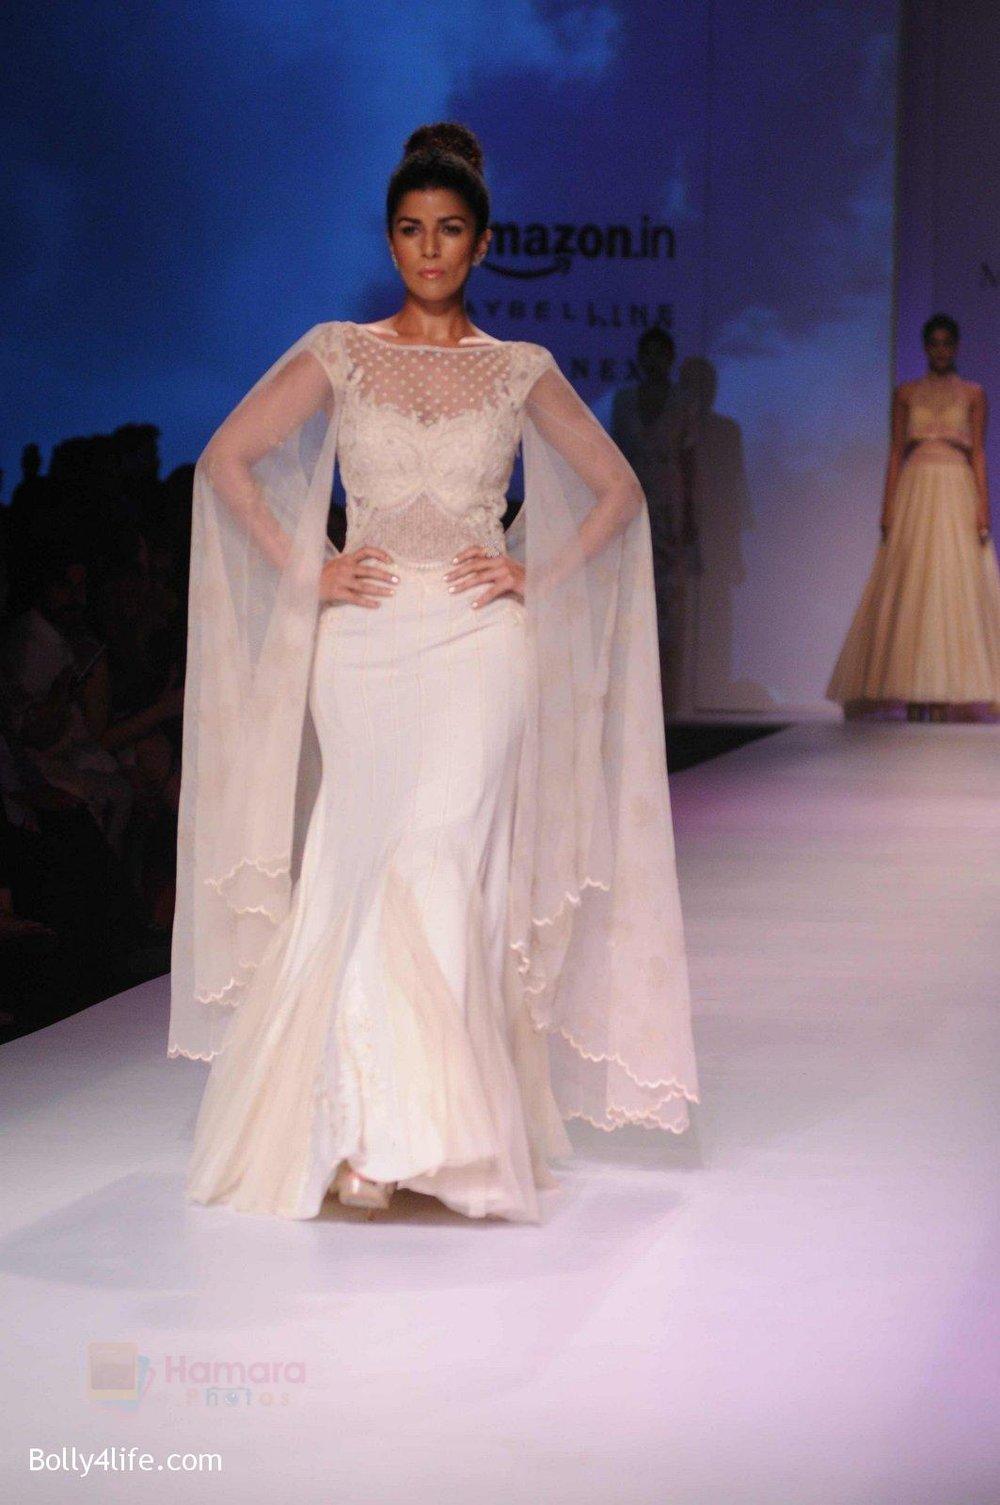 Nimrat-Kaur-walk-the-ramp-for-Mandira-Wrik_s-show-at-Amazon-India-Fashion-Week-on-15th-Oct-2016-43.jpg